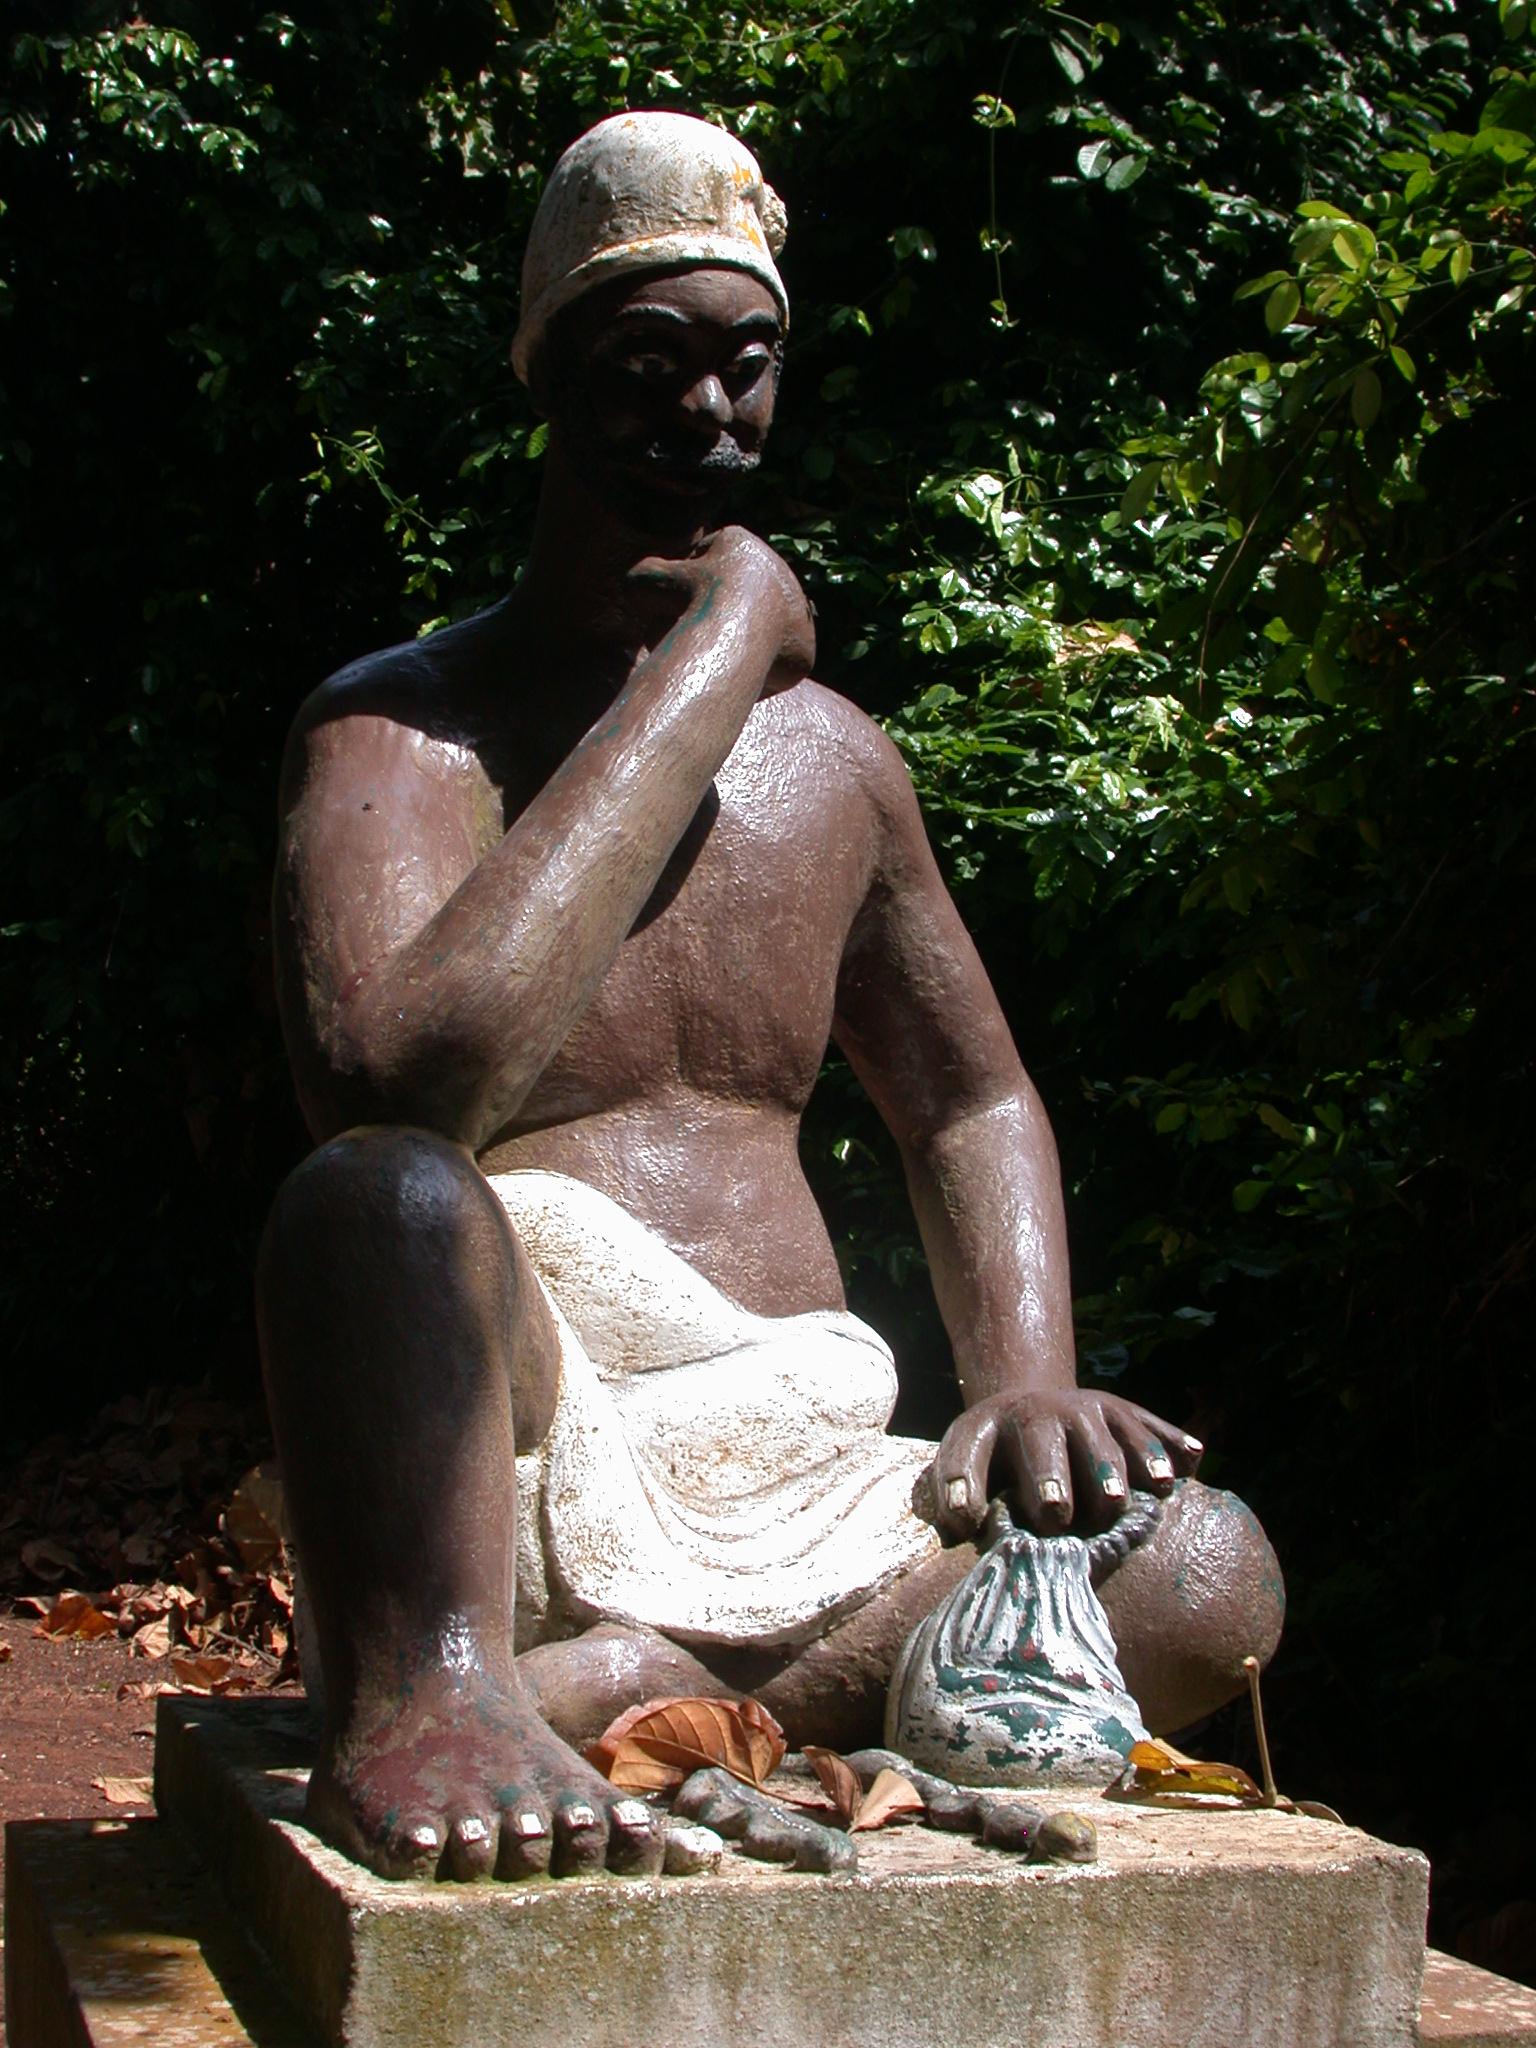 Bokonon Fa Diviner Sculpture, Kpasse Sacred Forest, Ouidah, Benin